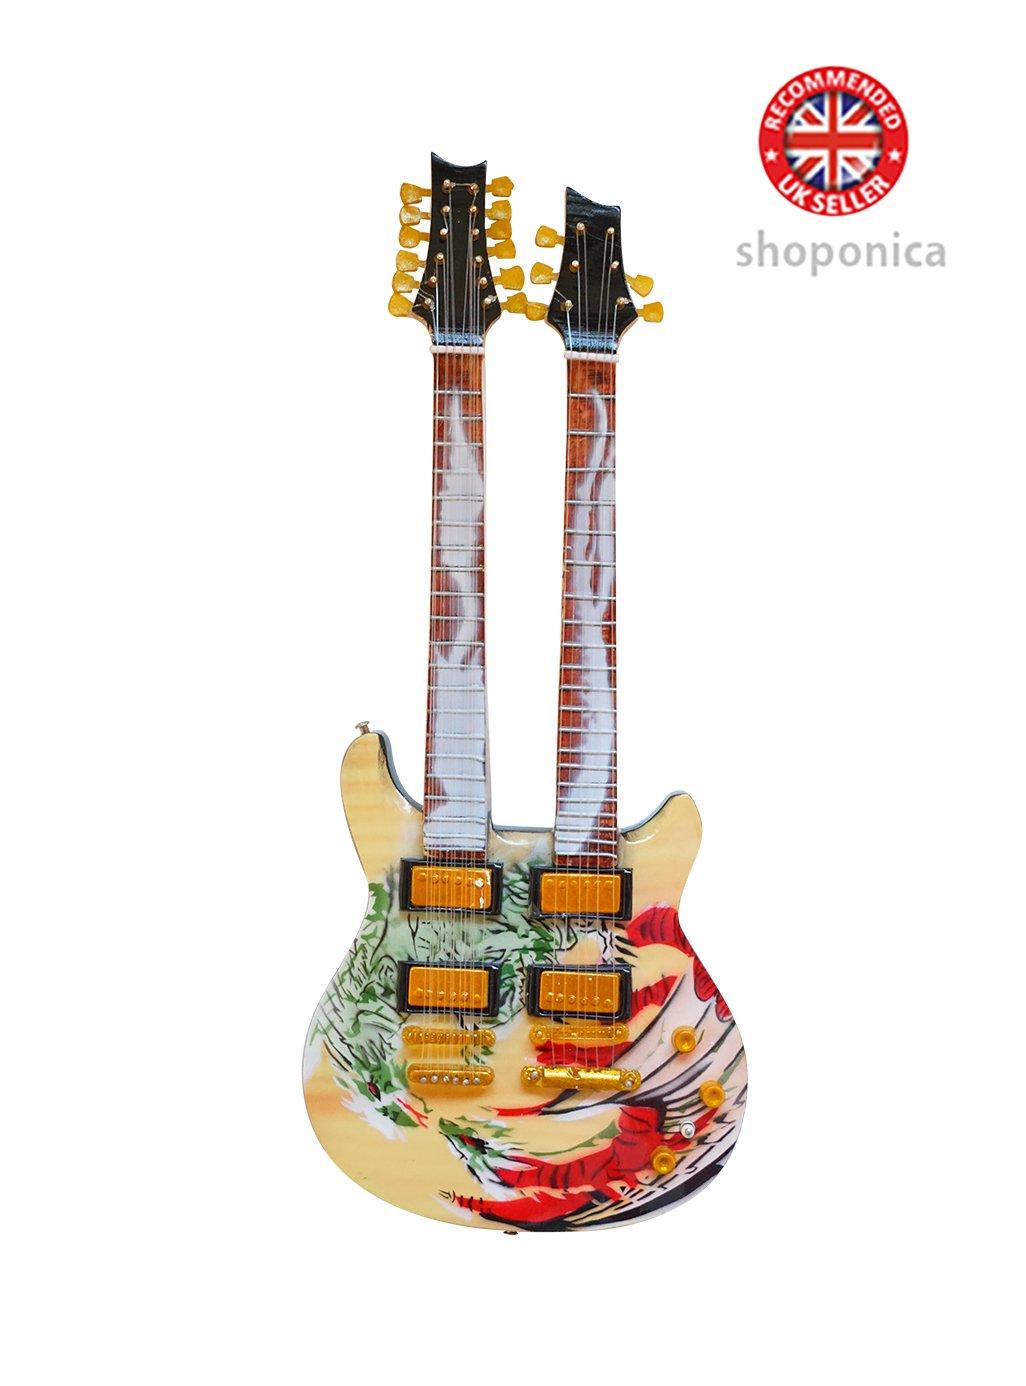 Carlos Santana Doppelter Hals Drachen Signature Holz Miniatur-Gitarre Music Legends